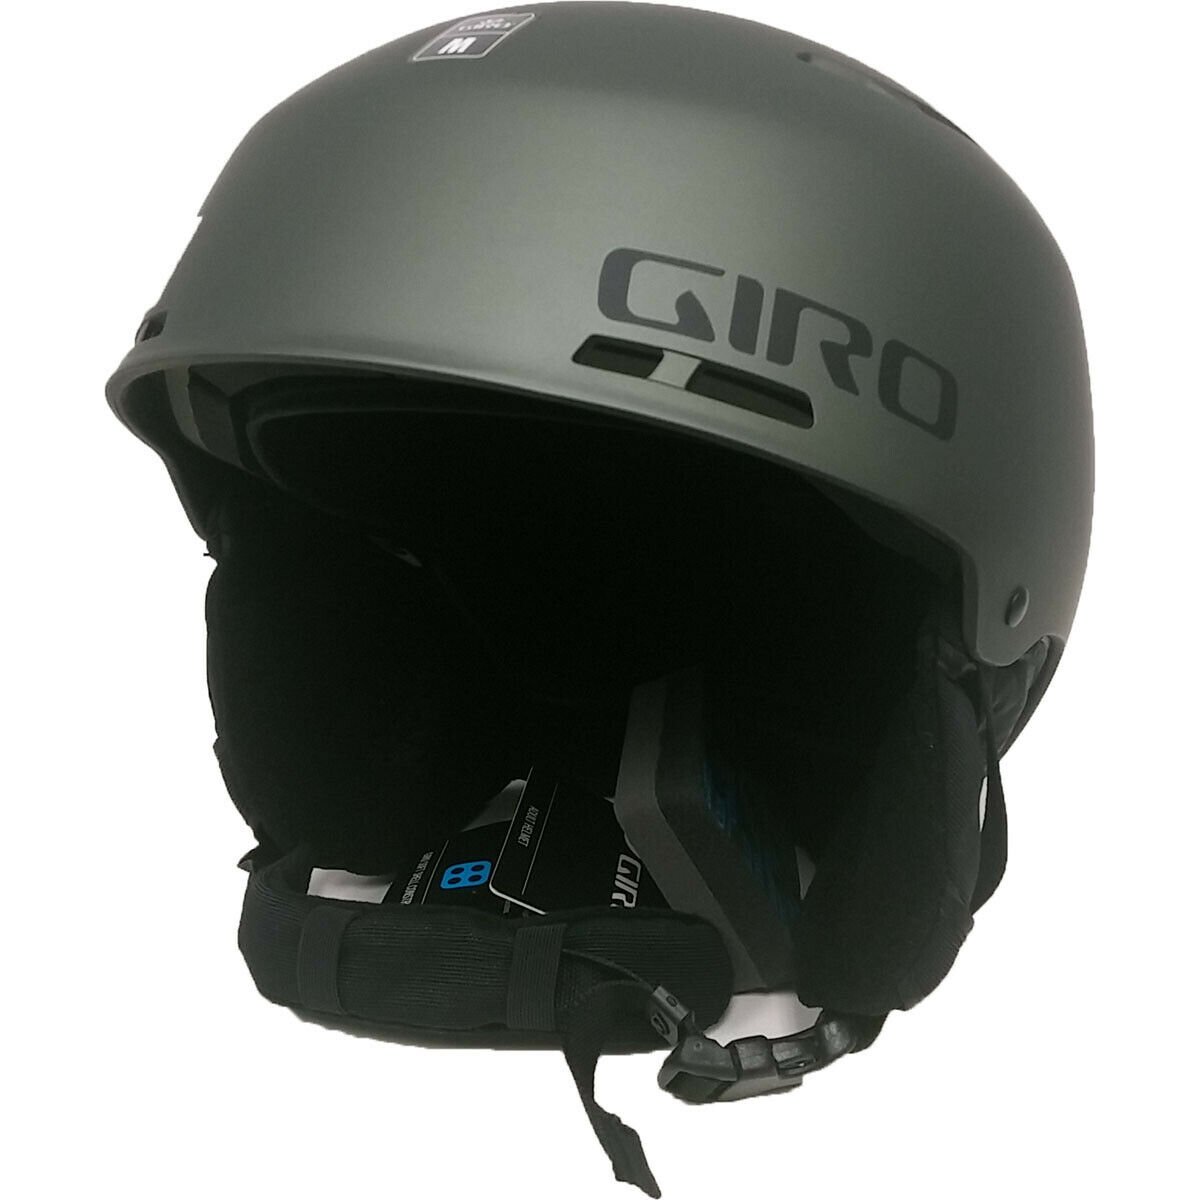 Giro Combyn Skiing Snow Sports Helmet Matte Olive Adult Medium M 55.5 59 cm